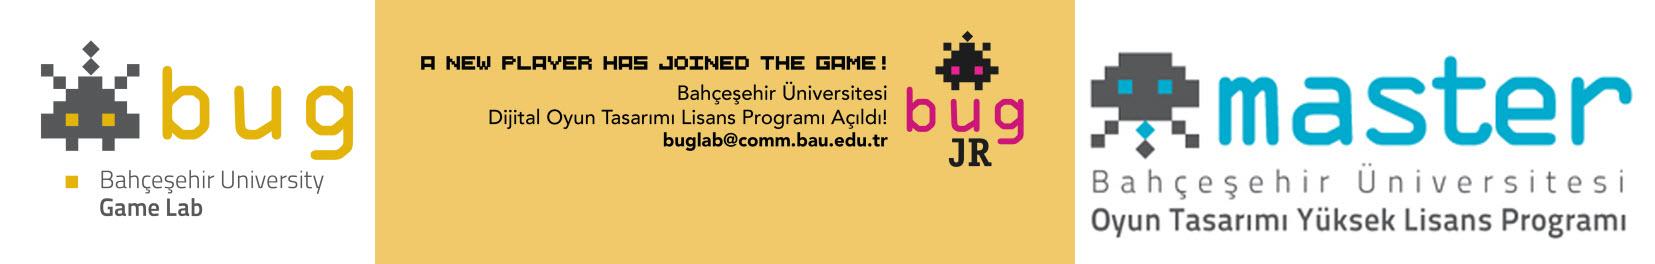 bug-game-lab